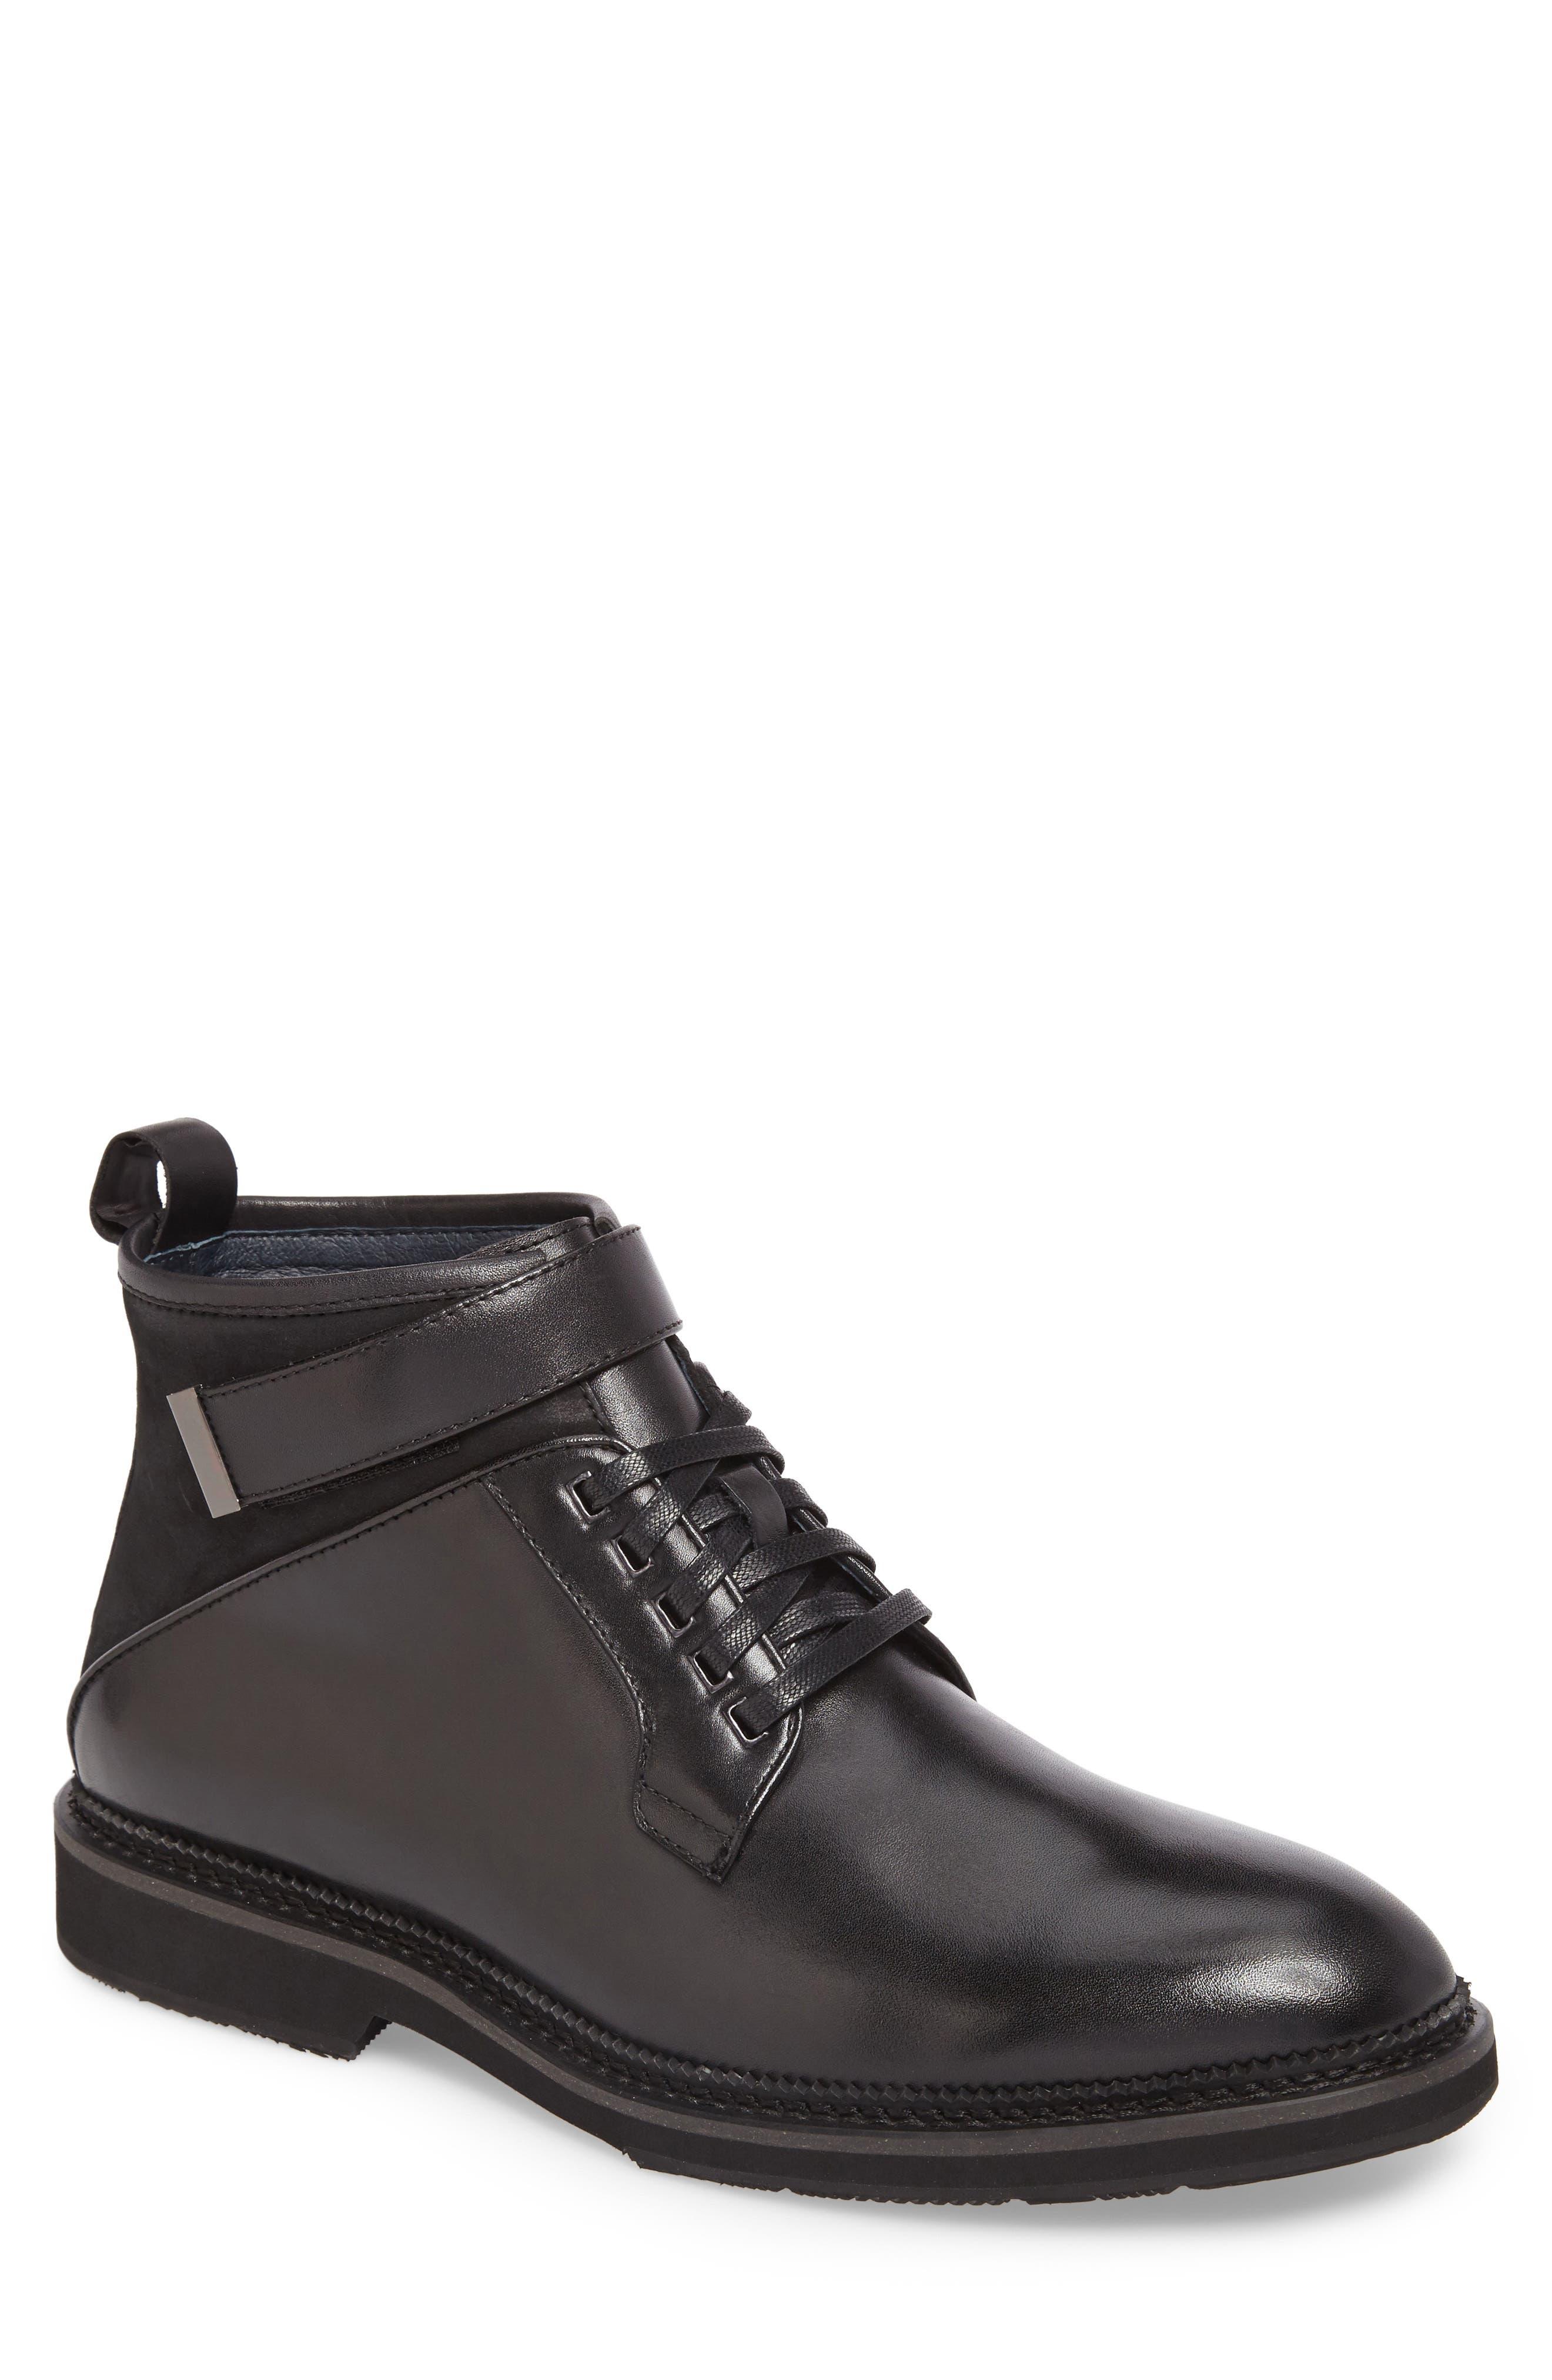 Alternate Image 1 Selected - Zanzara Ginko Plain Toe Boot (Men)